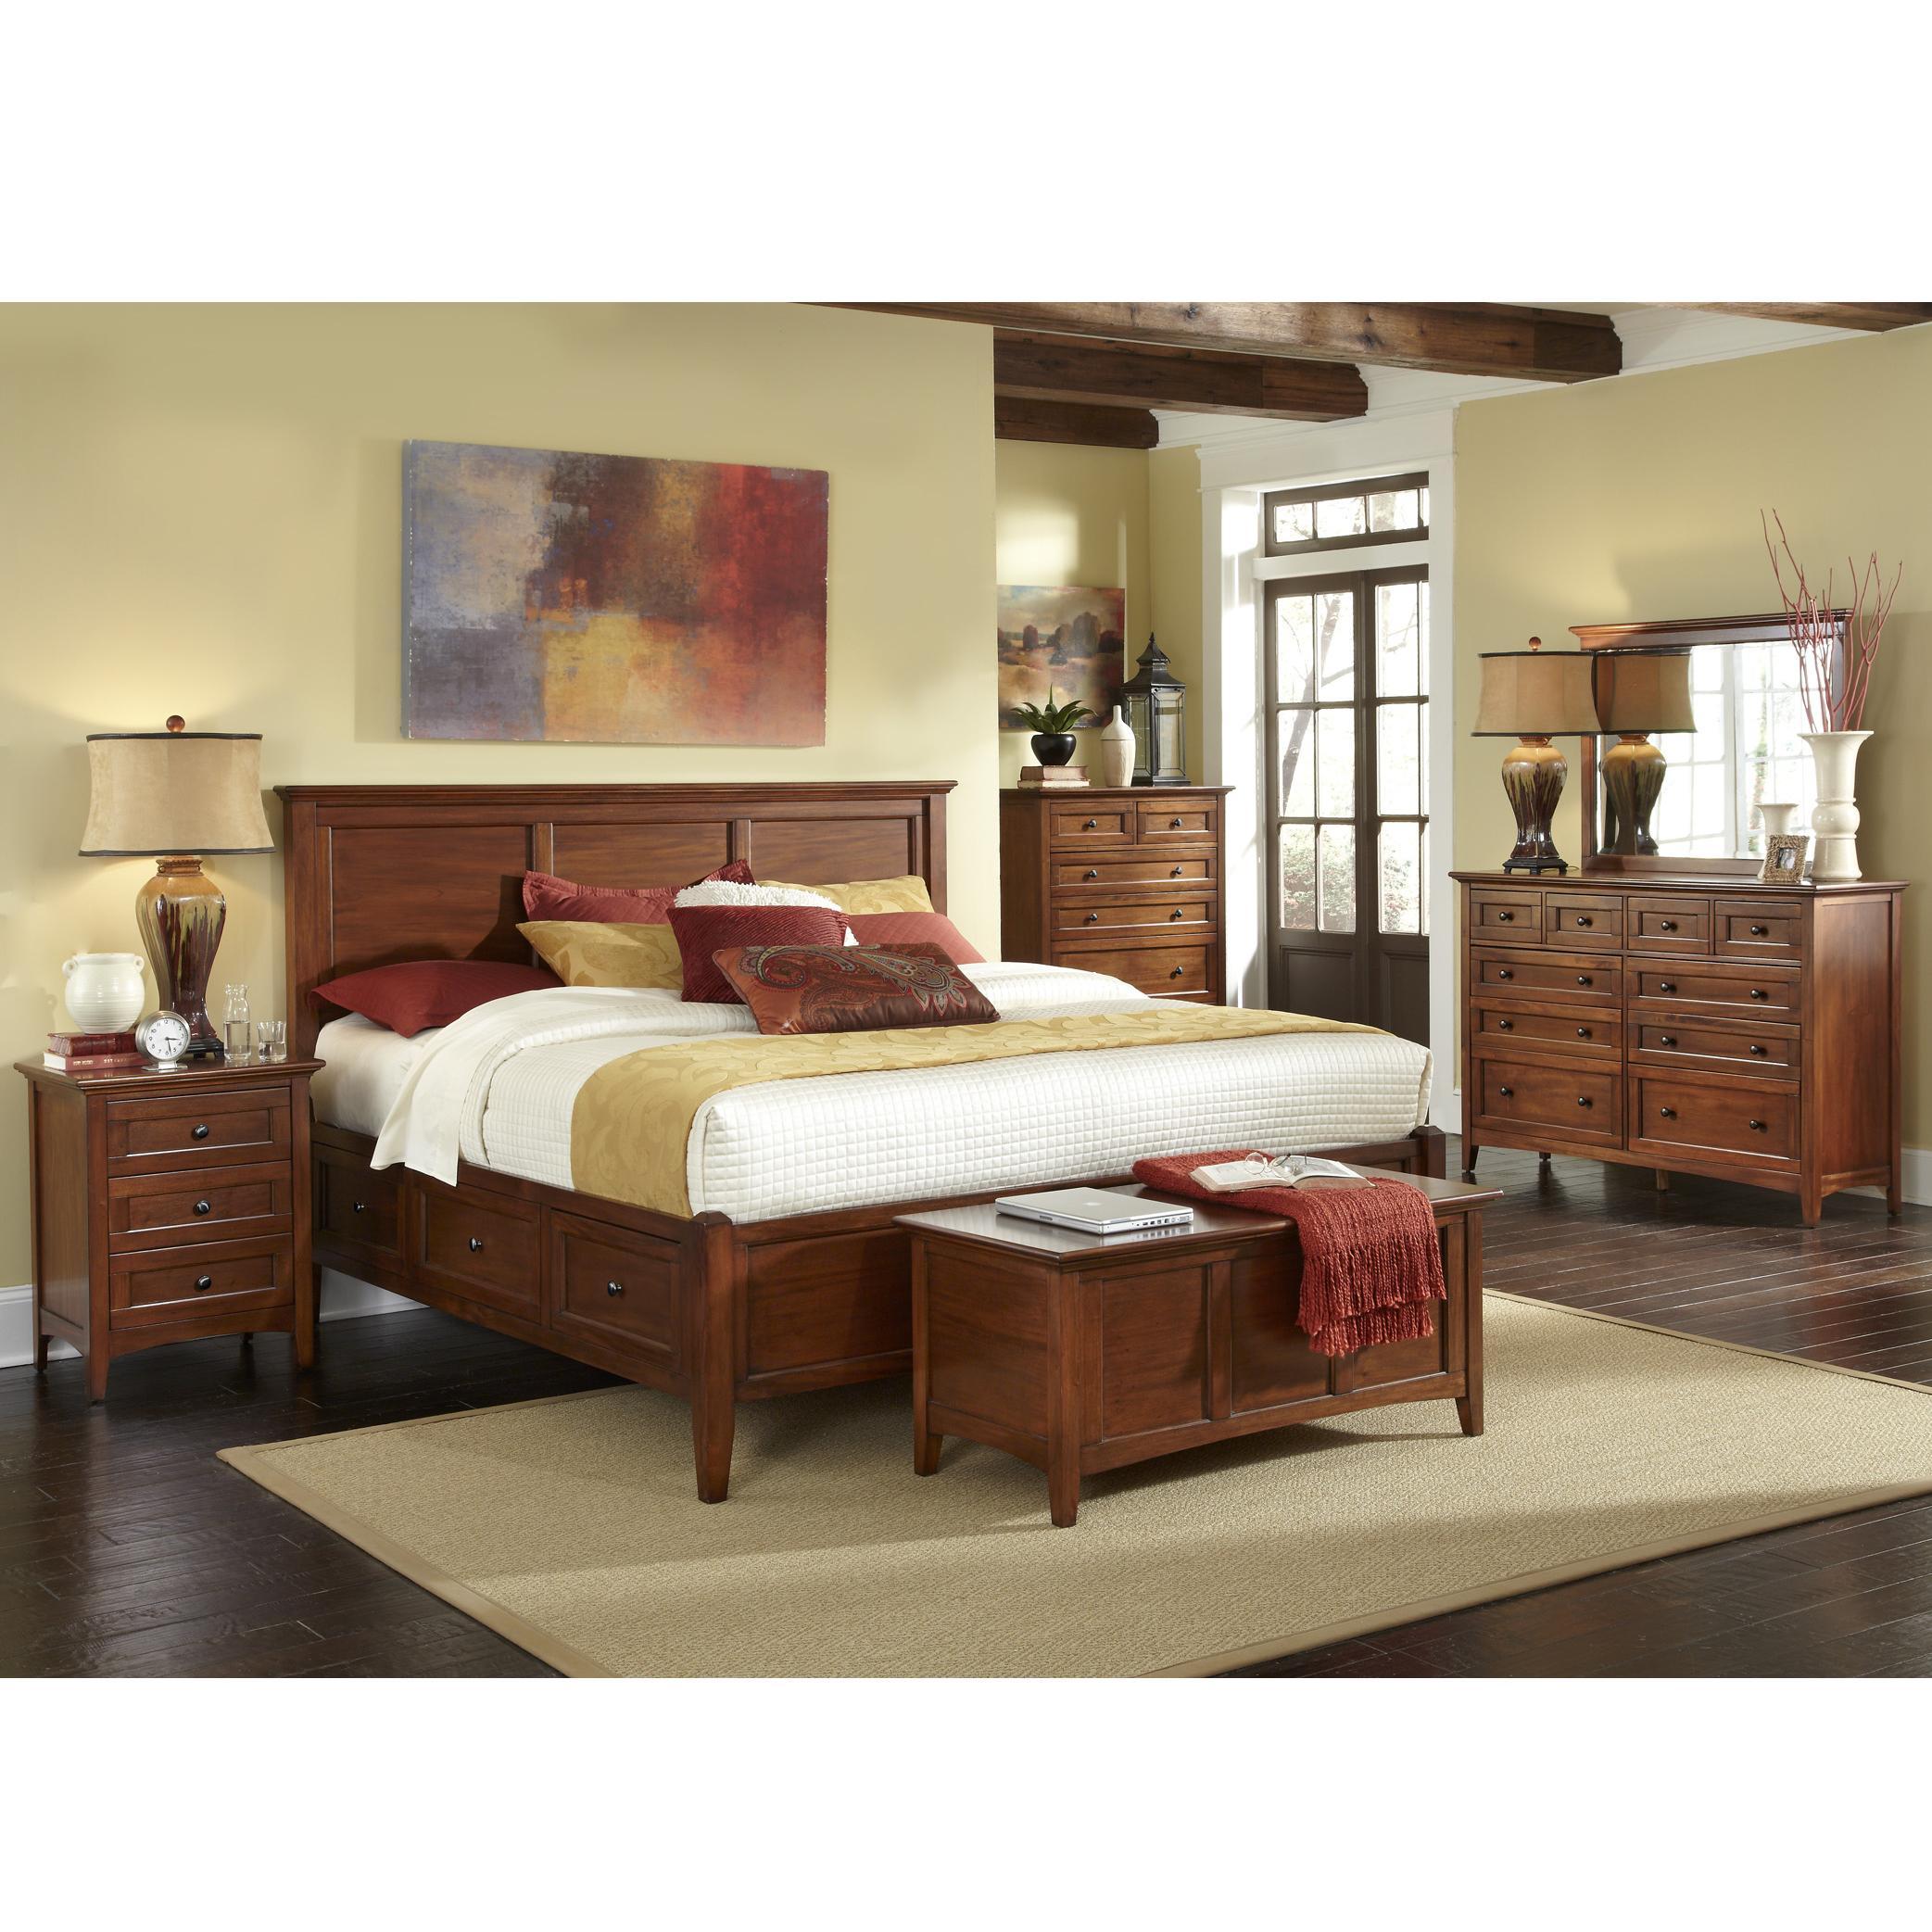 Westlake California King Storage Bedroom Group by AAmerica at Zak's Home